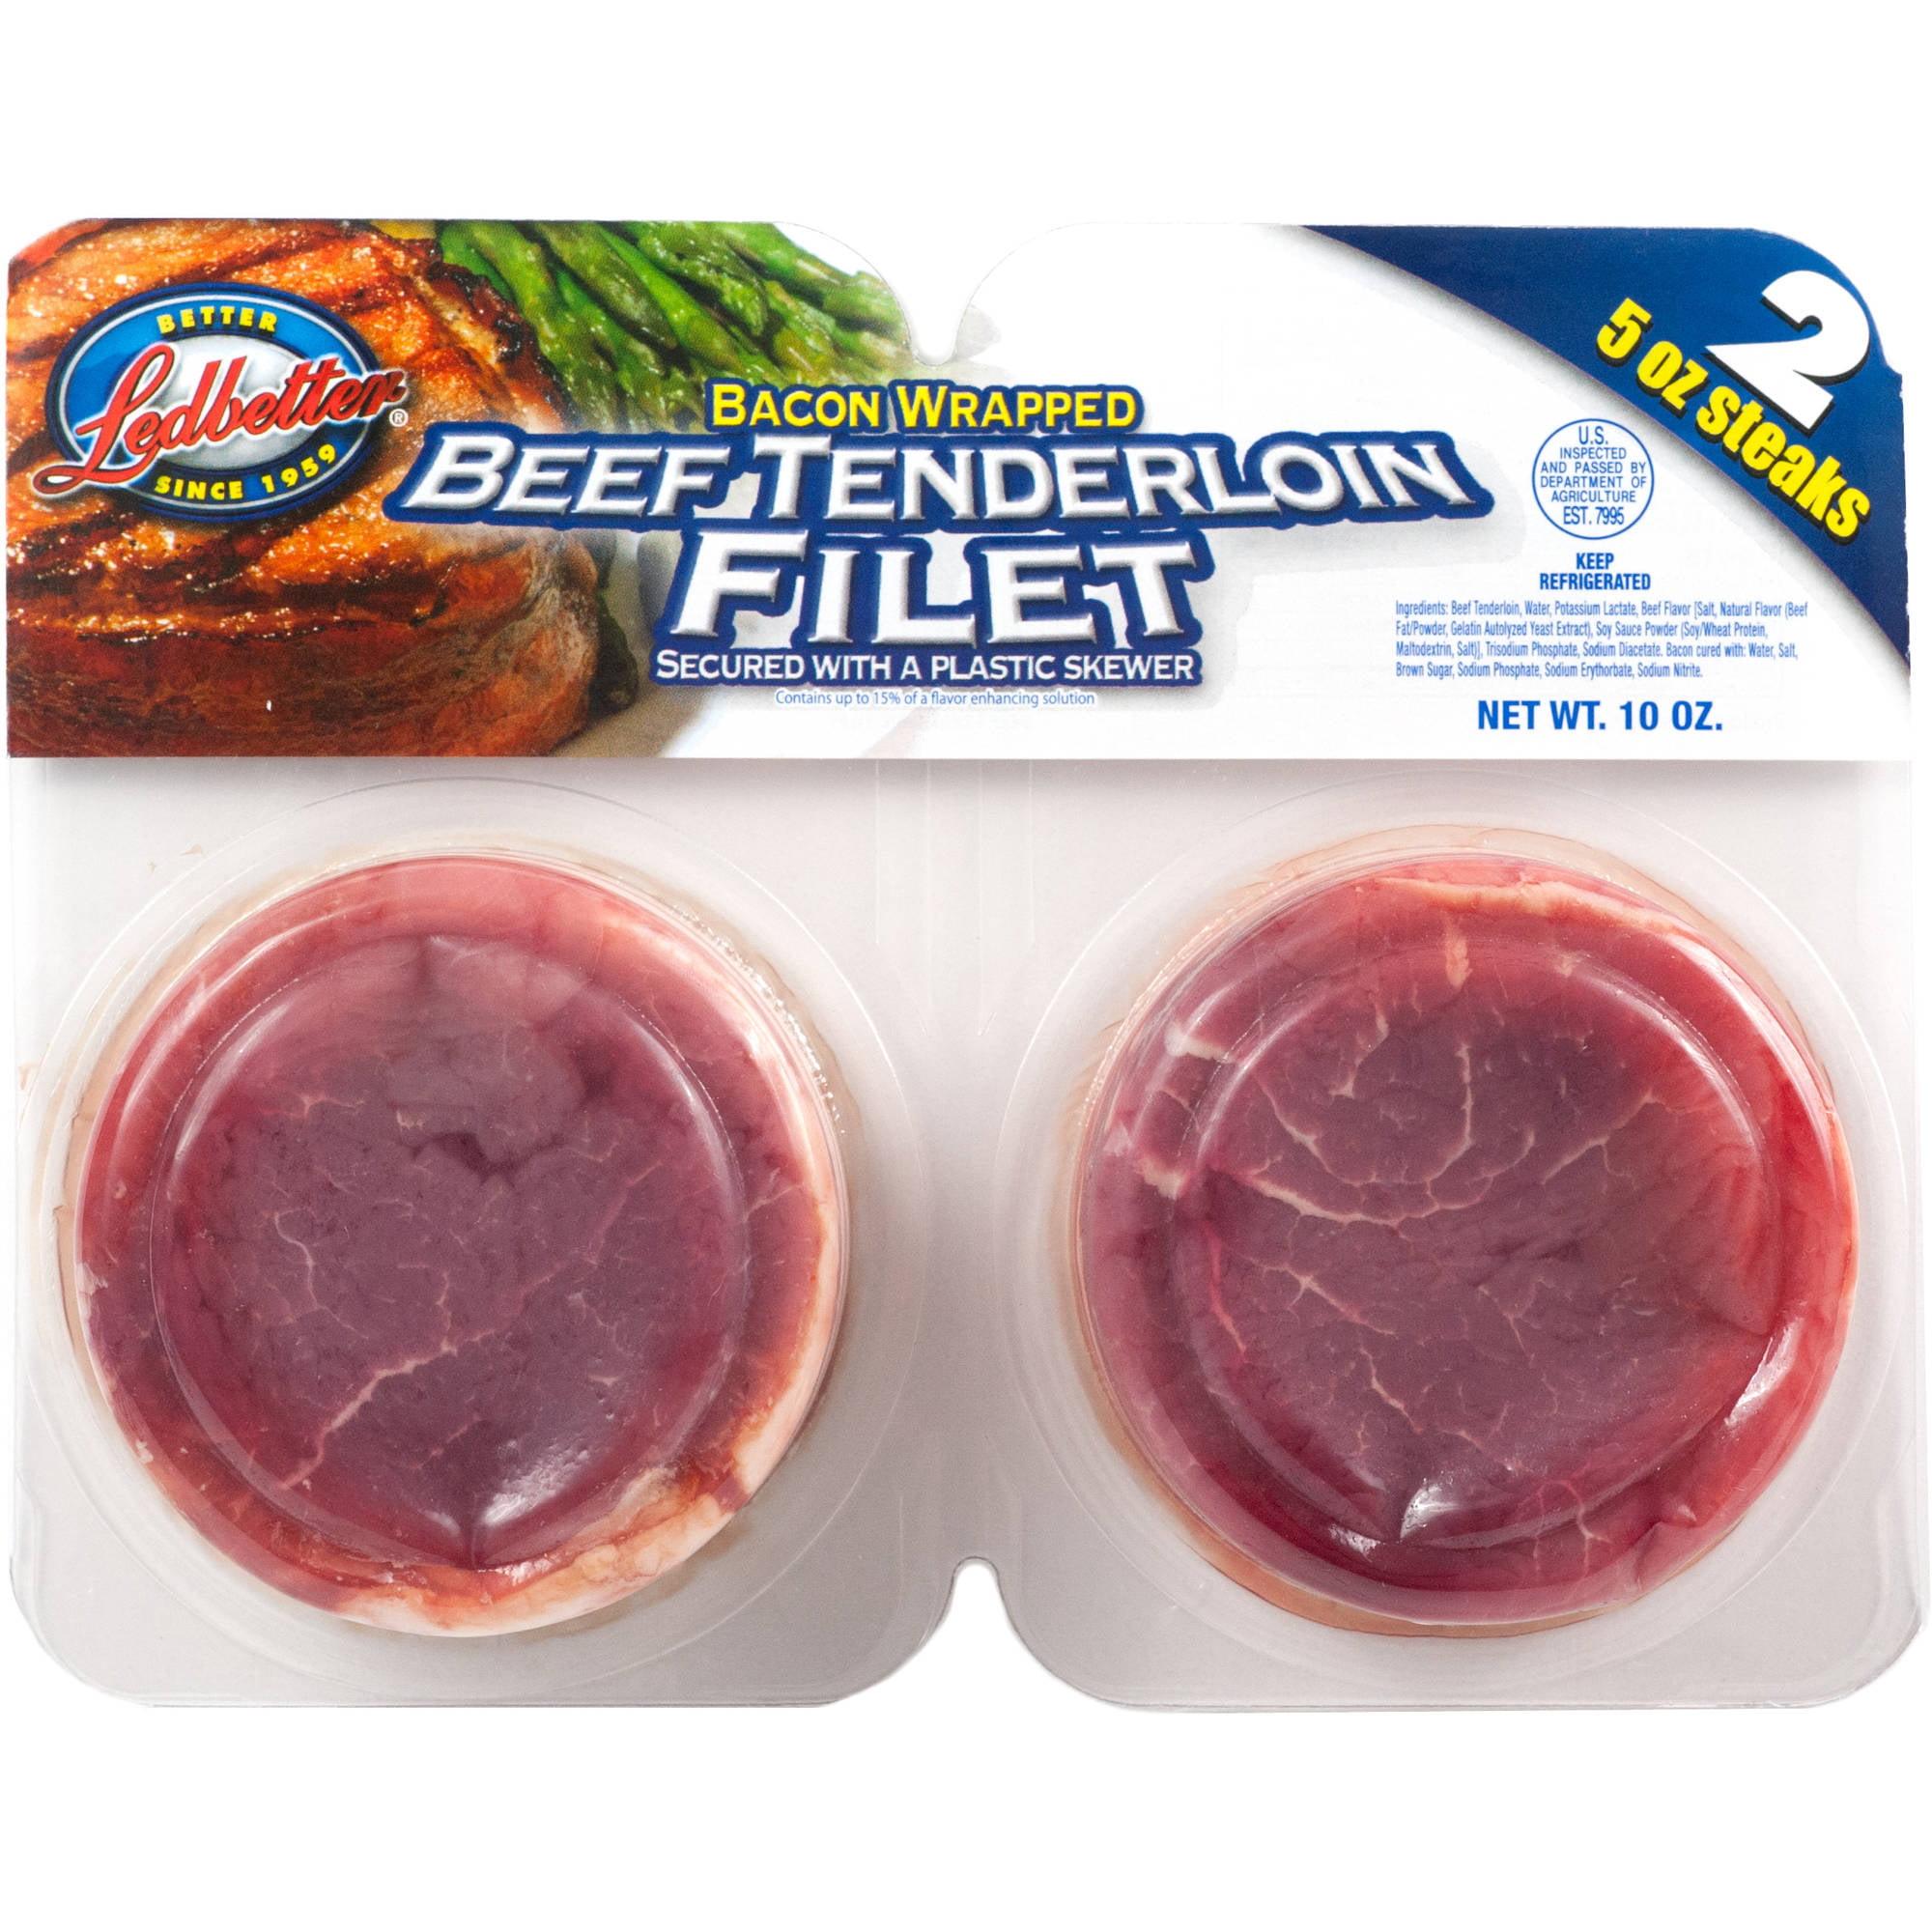 Ledbetter Bacon Wrapped Beef Tenderloin Filet, 5 oz, 2 count